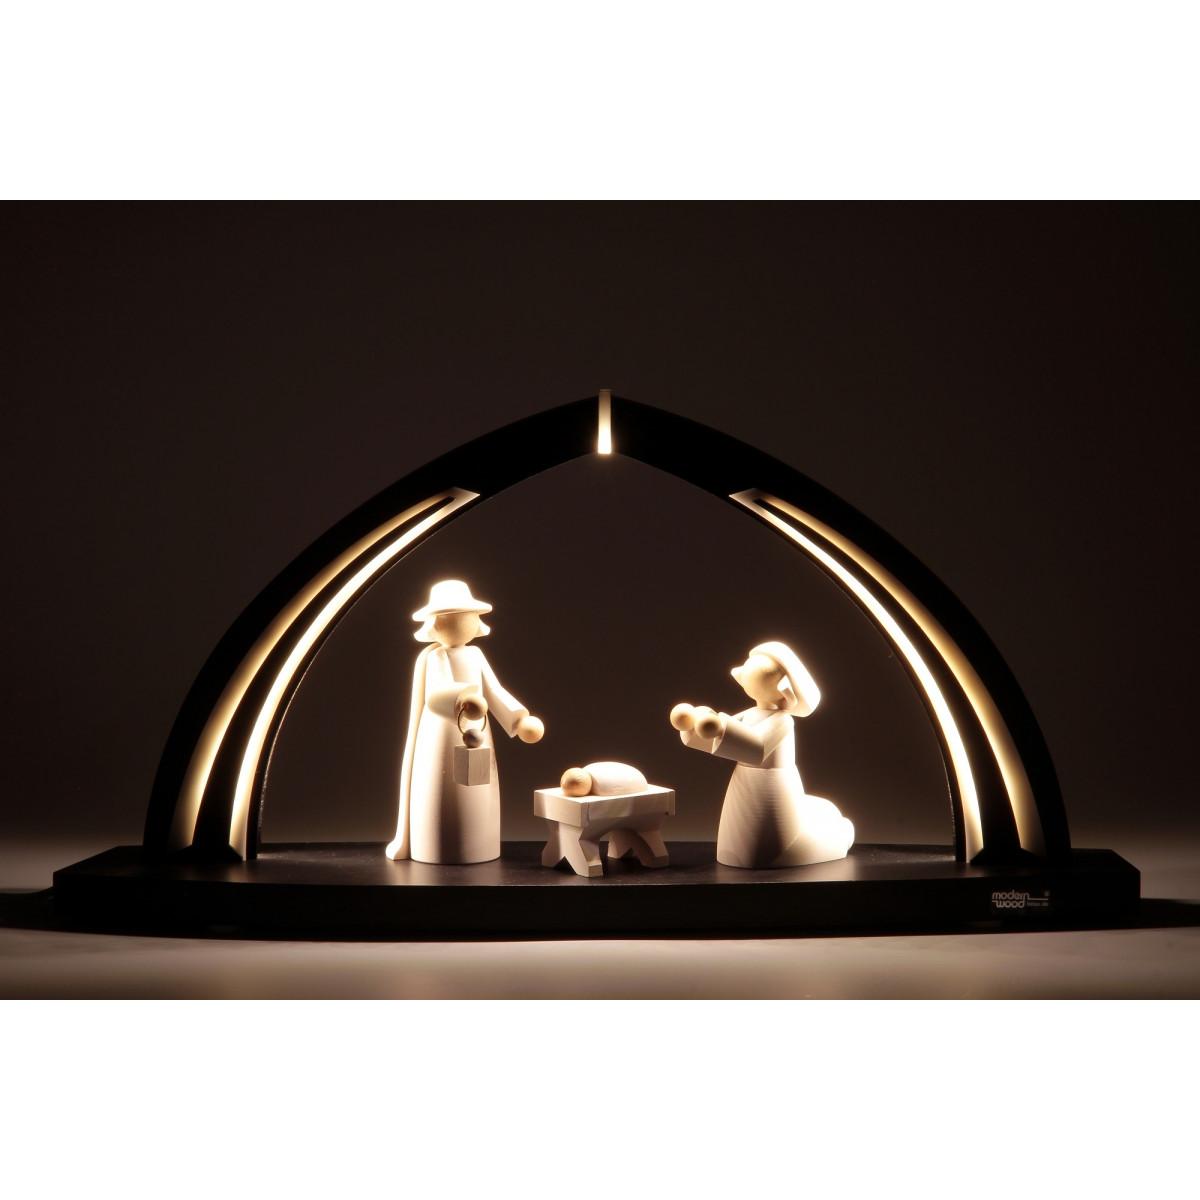 led schwibbogen mit christi geburt figuren erzgebirgskunst drechsel. Black Bedroom Furniture Sets. Home Design Ideas